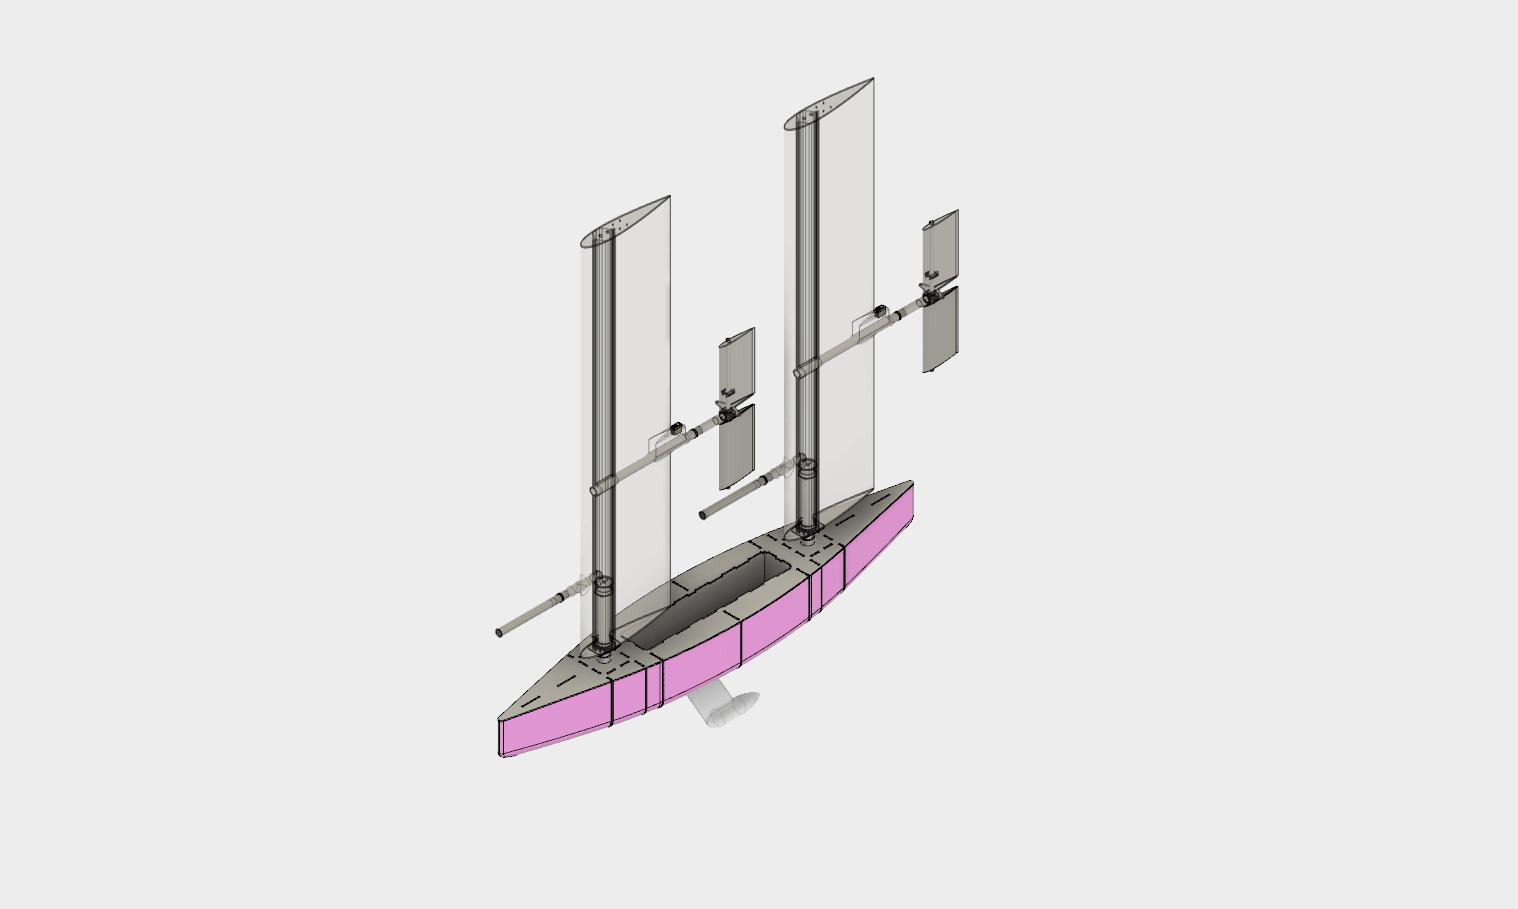 Microtransat Challenge design